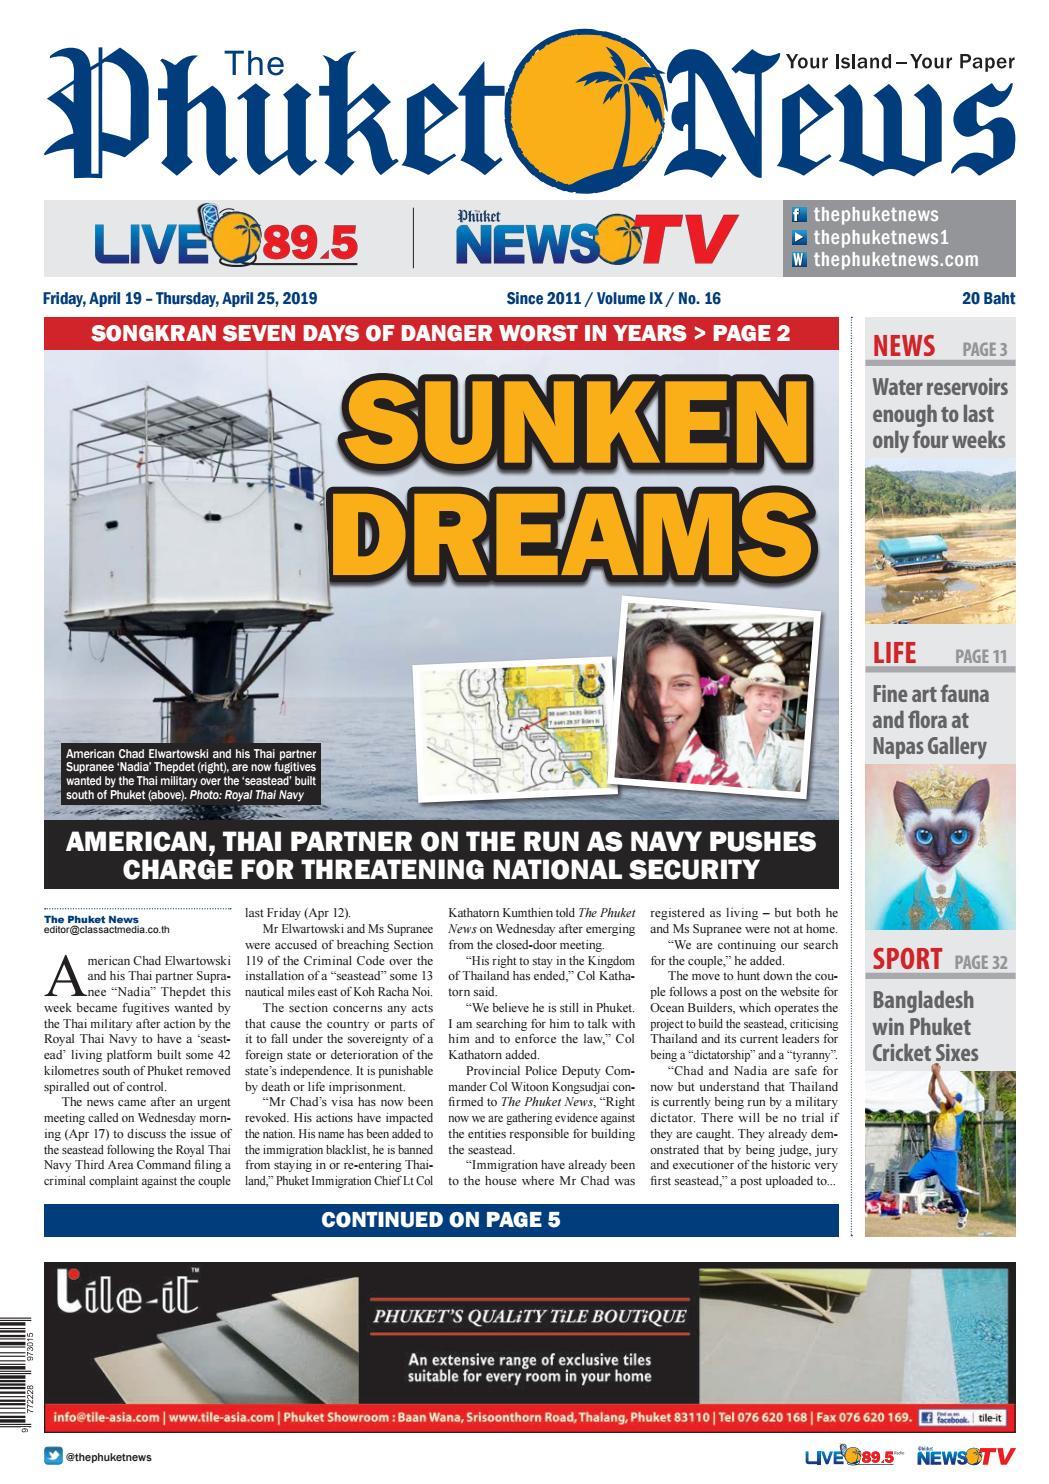 The Phuket News 19 April 2019 by The Phuket News - issuu